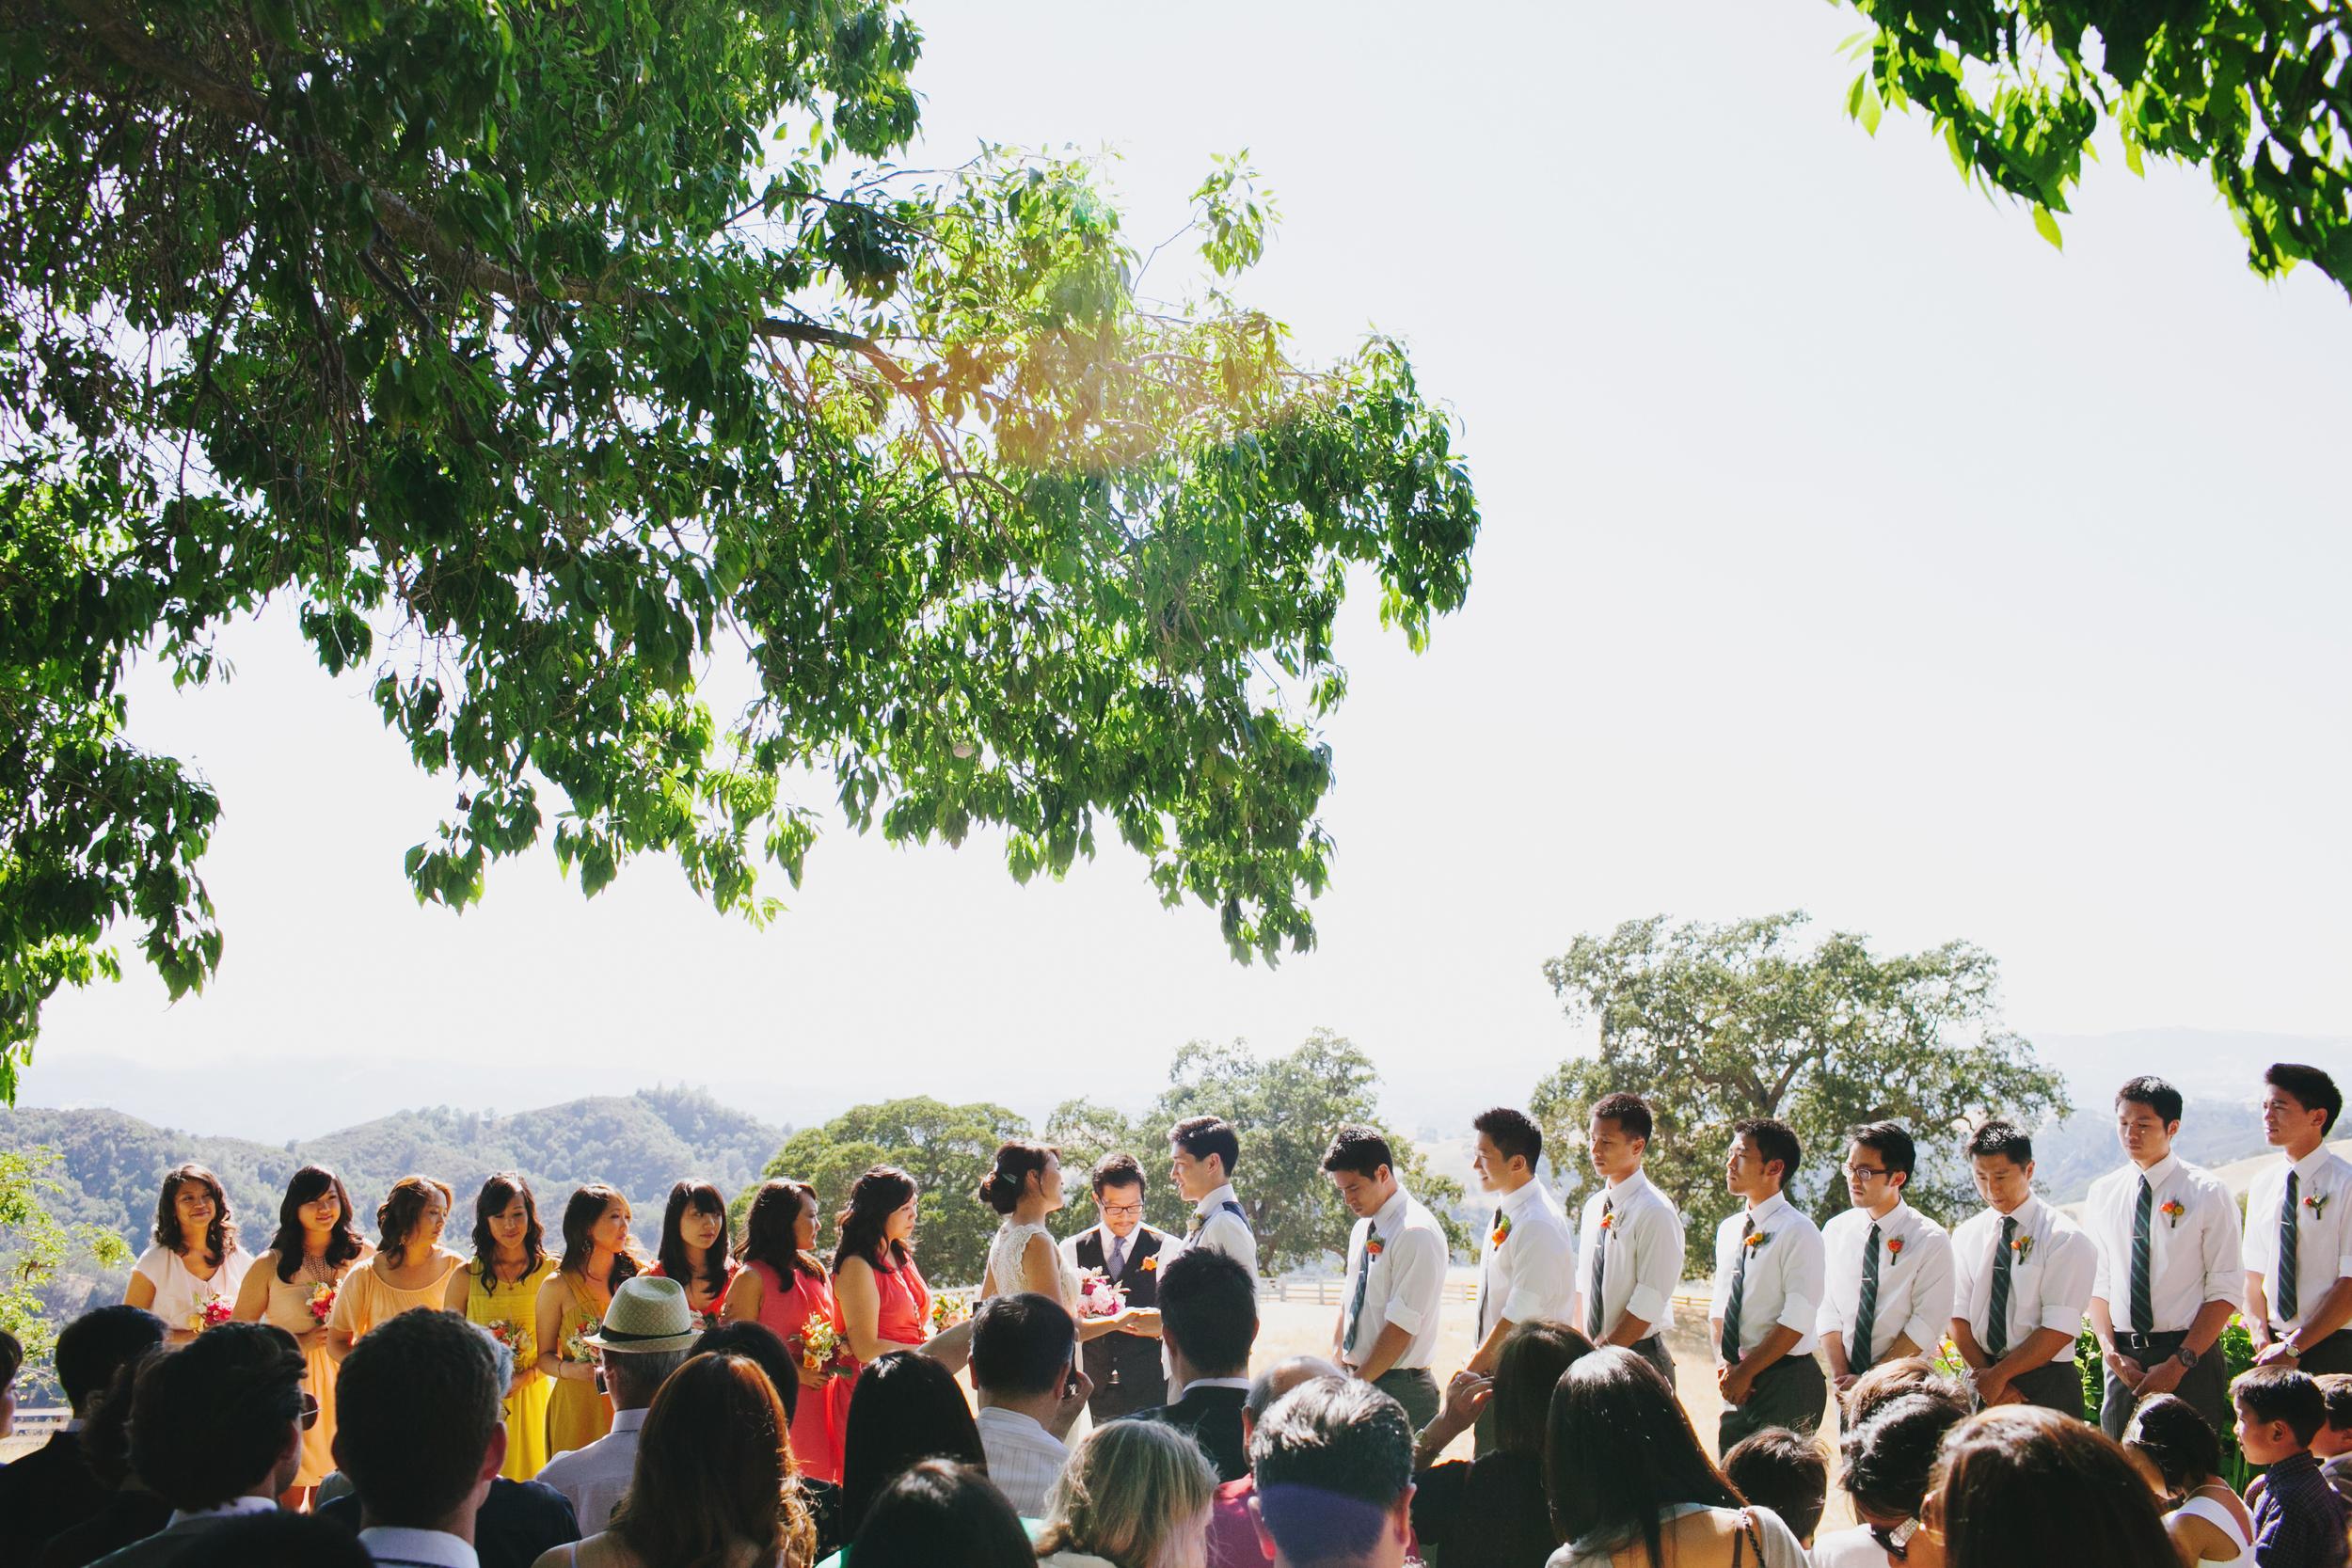 Diablo_Ranch_Wedding_Photography_Becky_Will-15.JPG